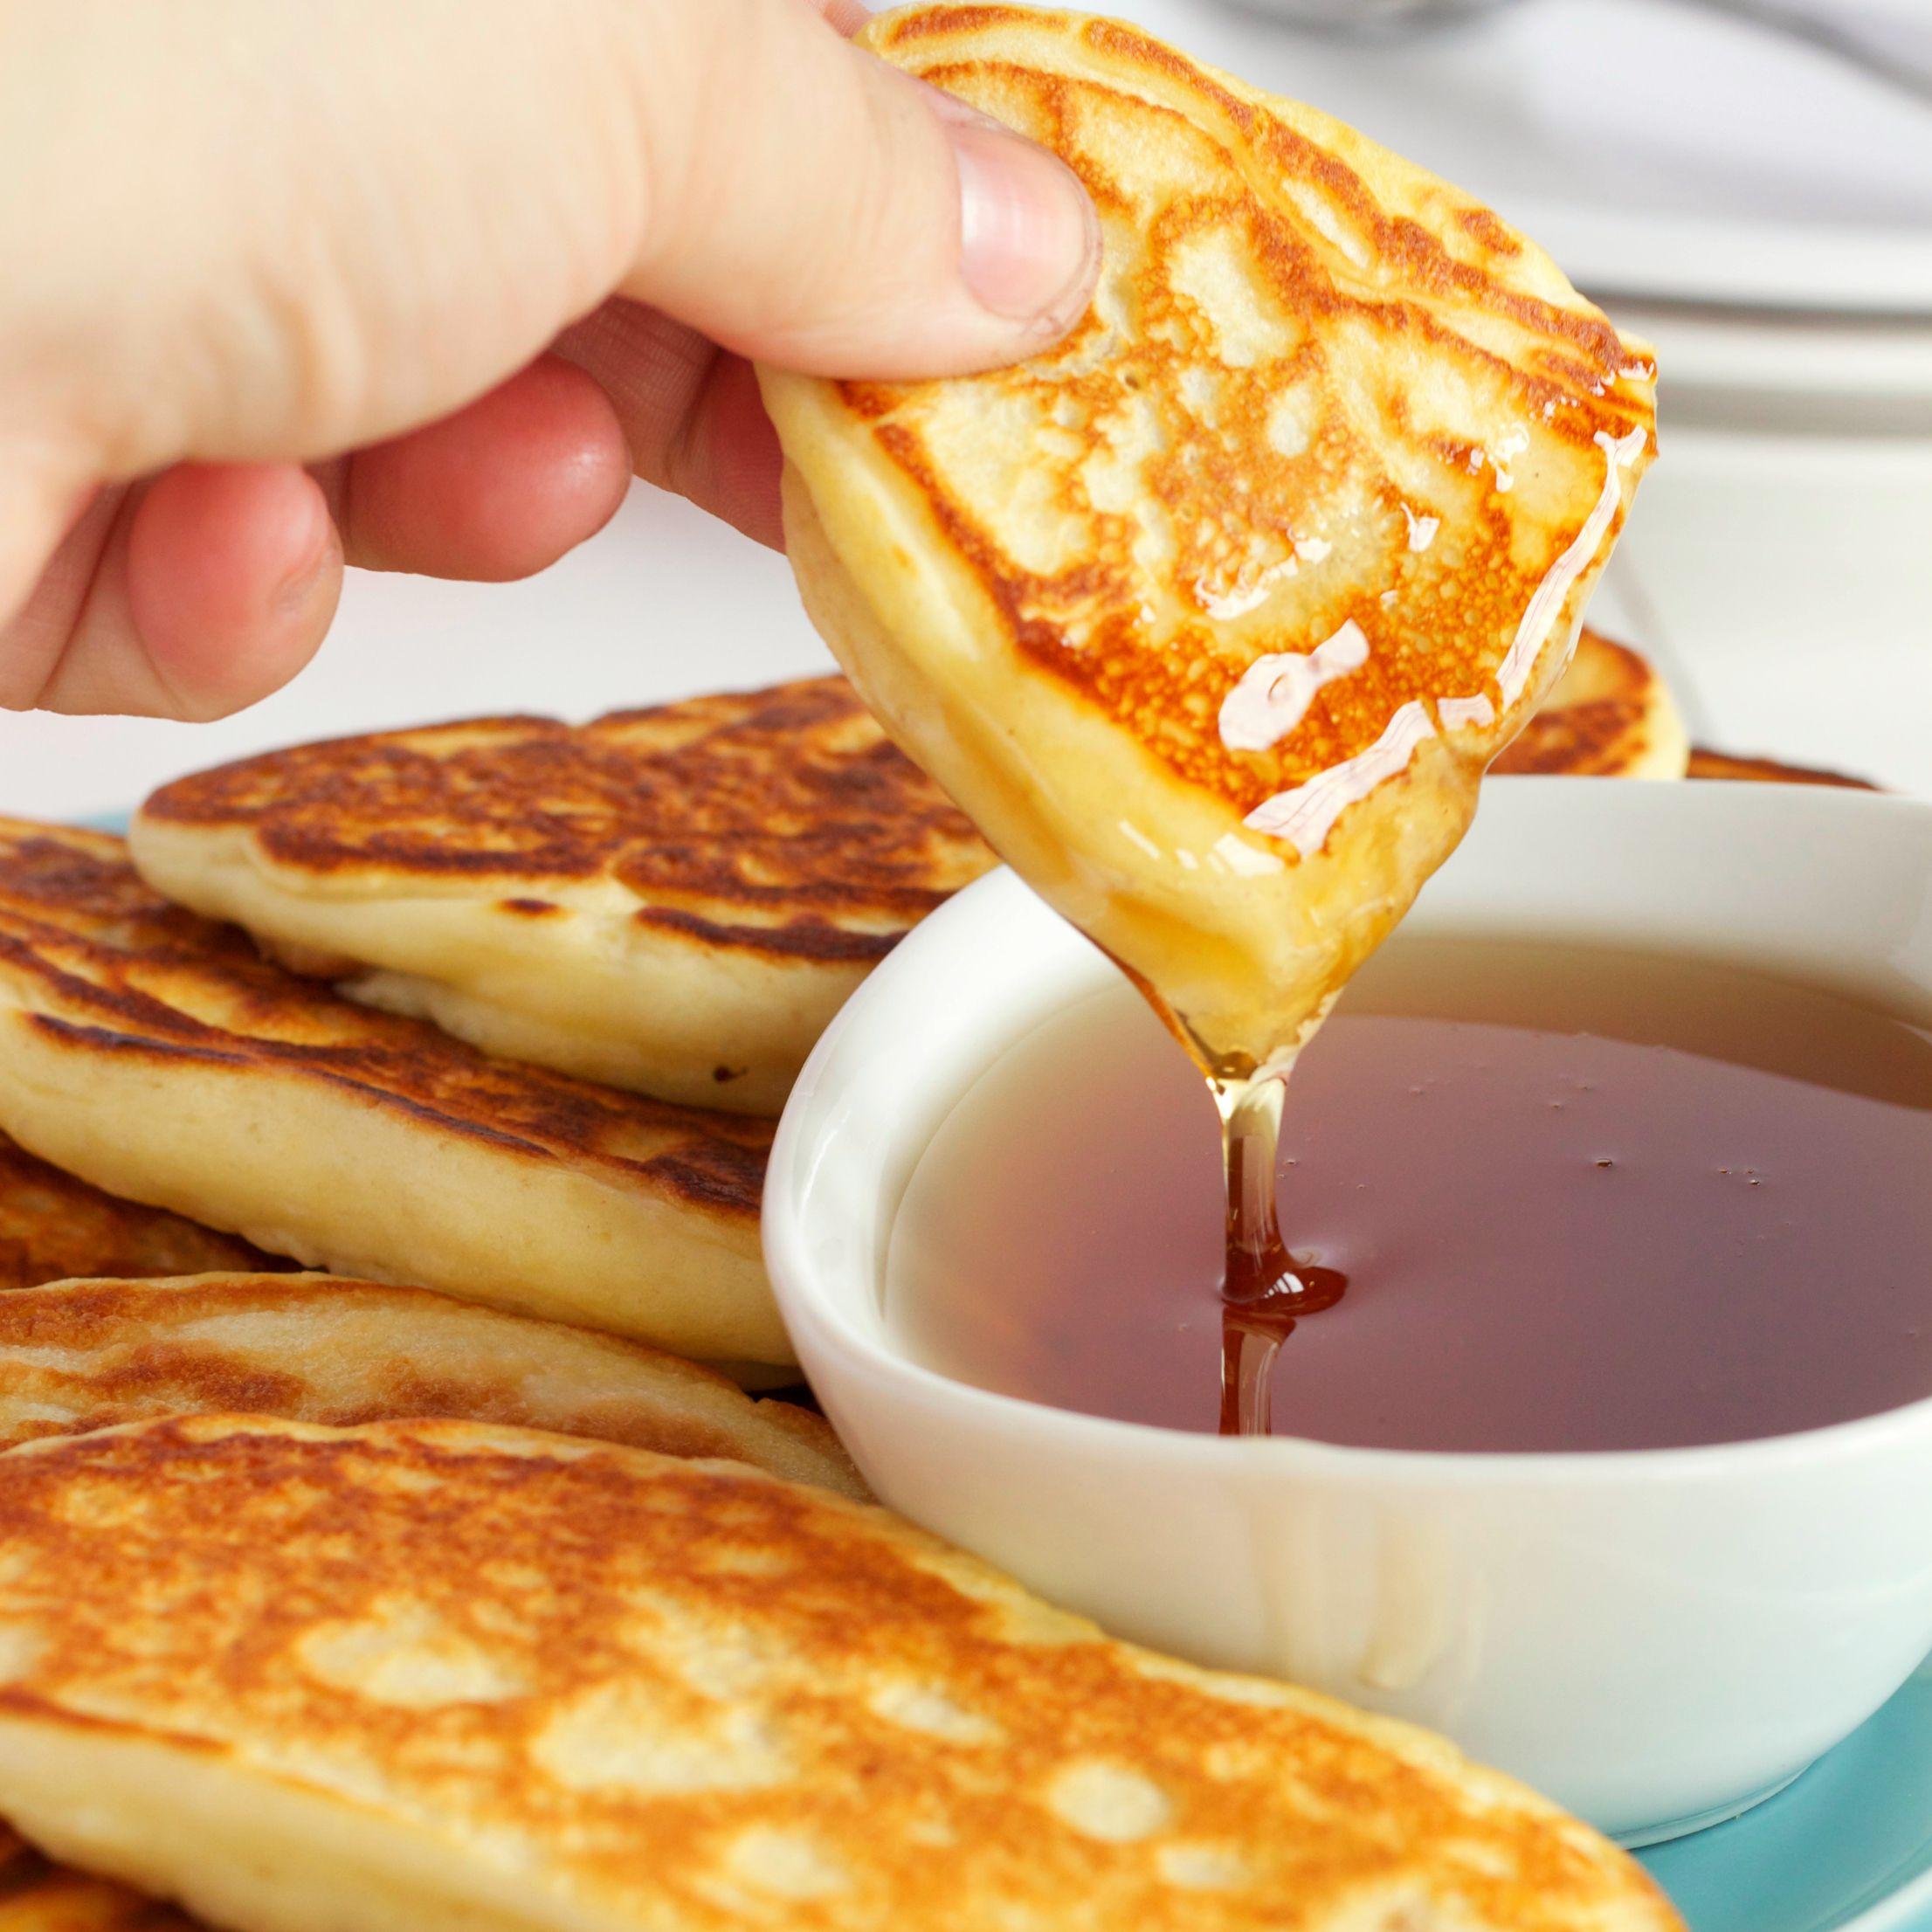 завтрак с блинчиками картинки регулярно